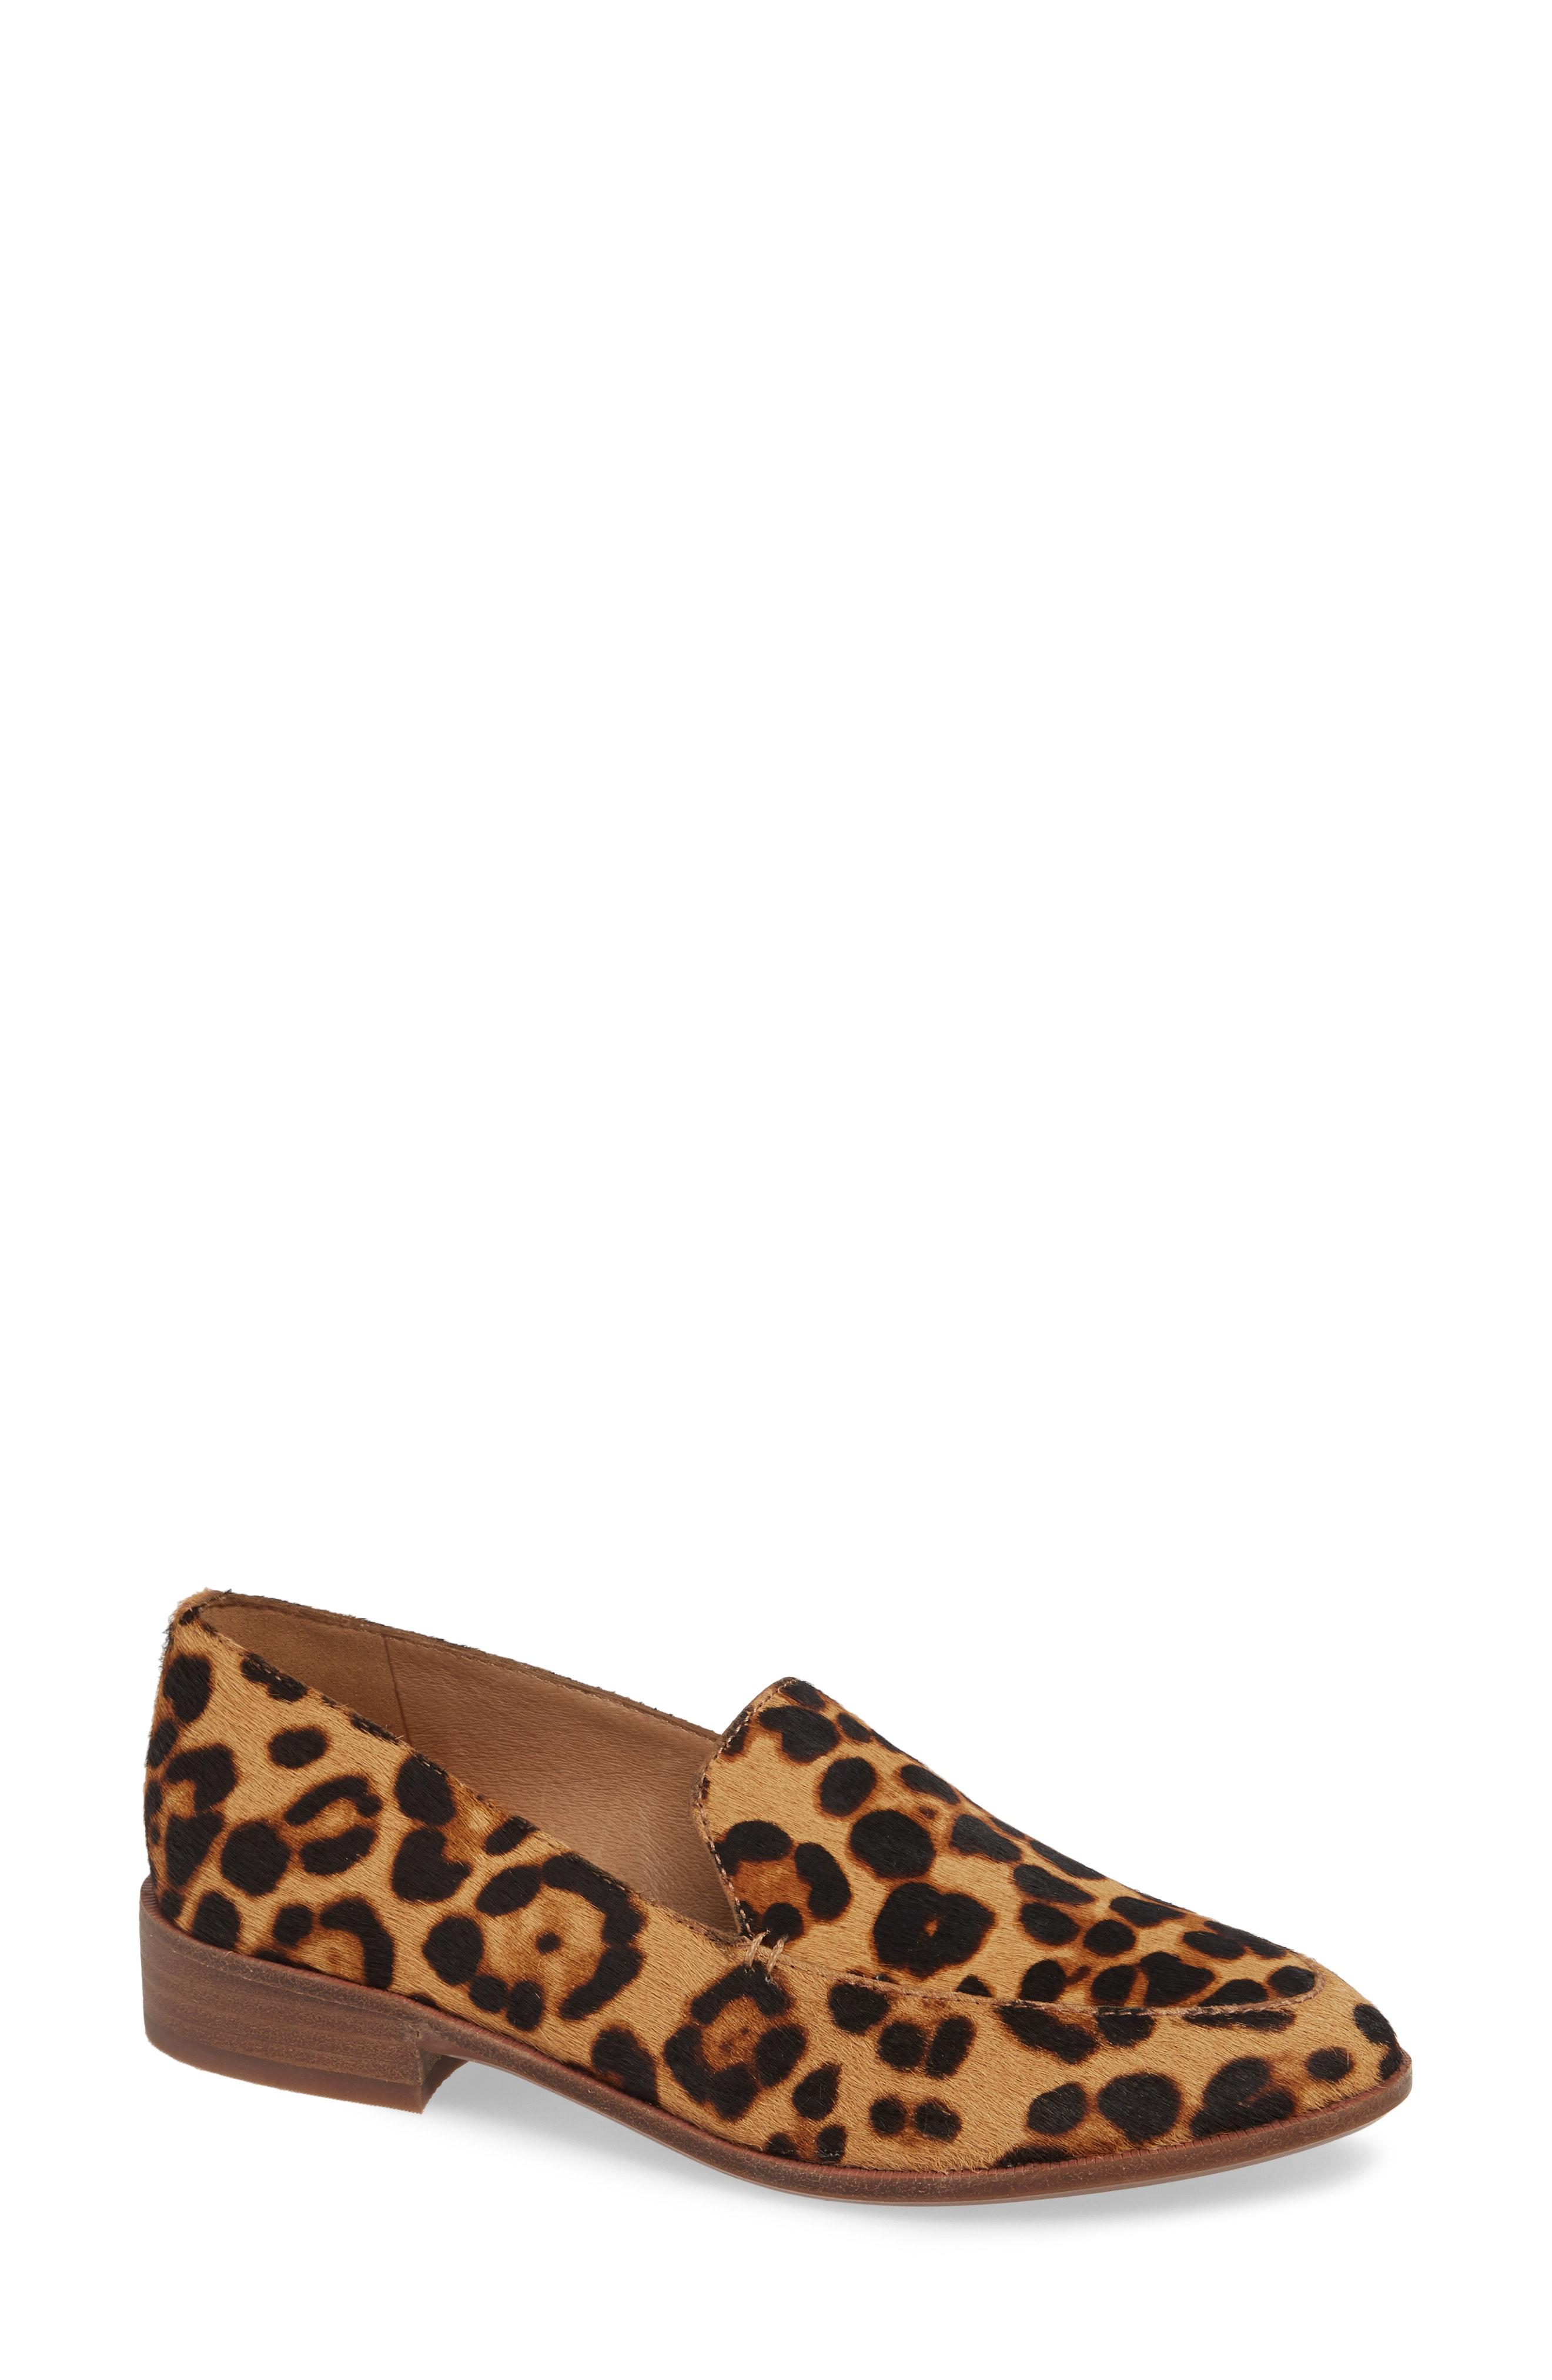 Madewell The Frances Genuine Calf Hair Loafer (Women)